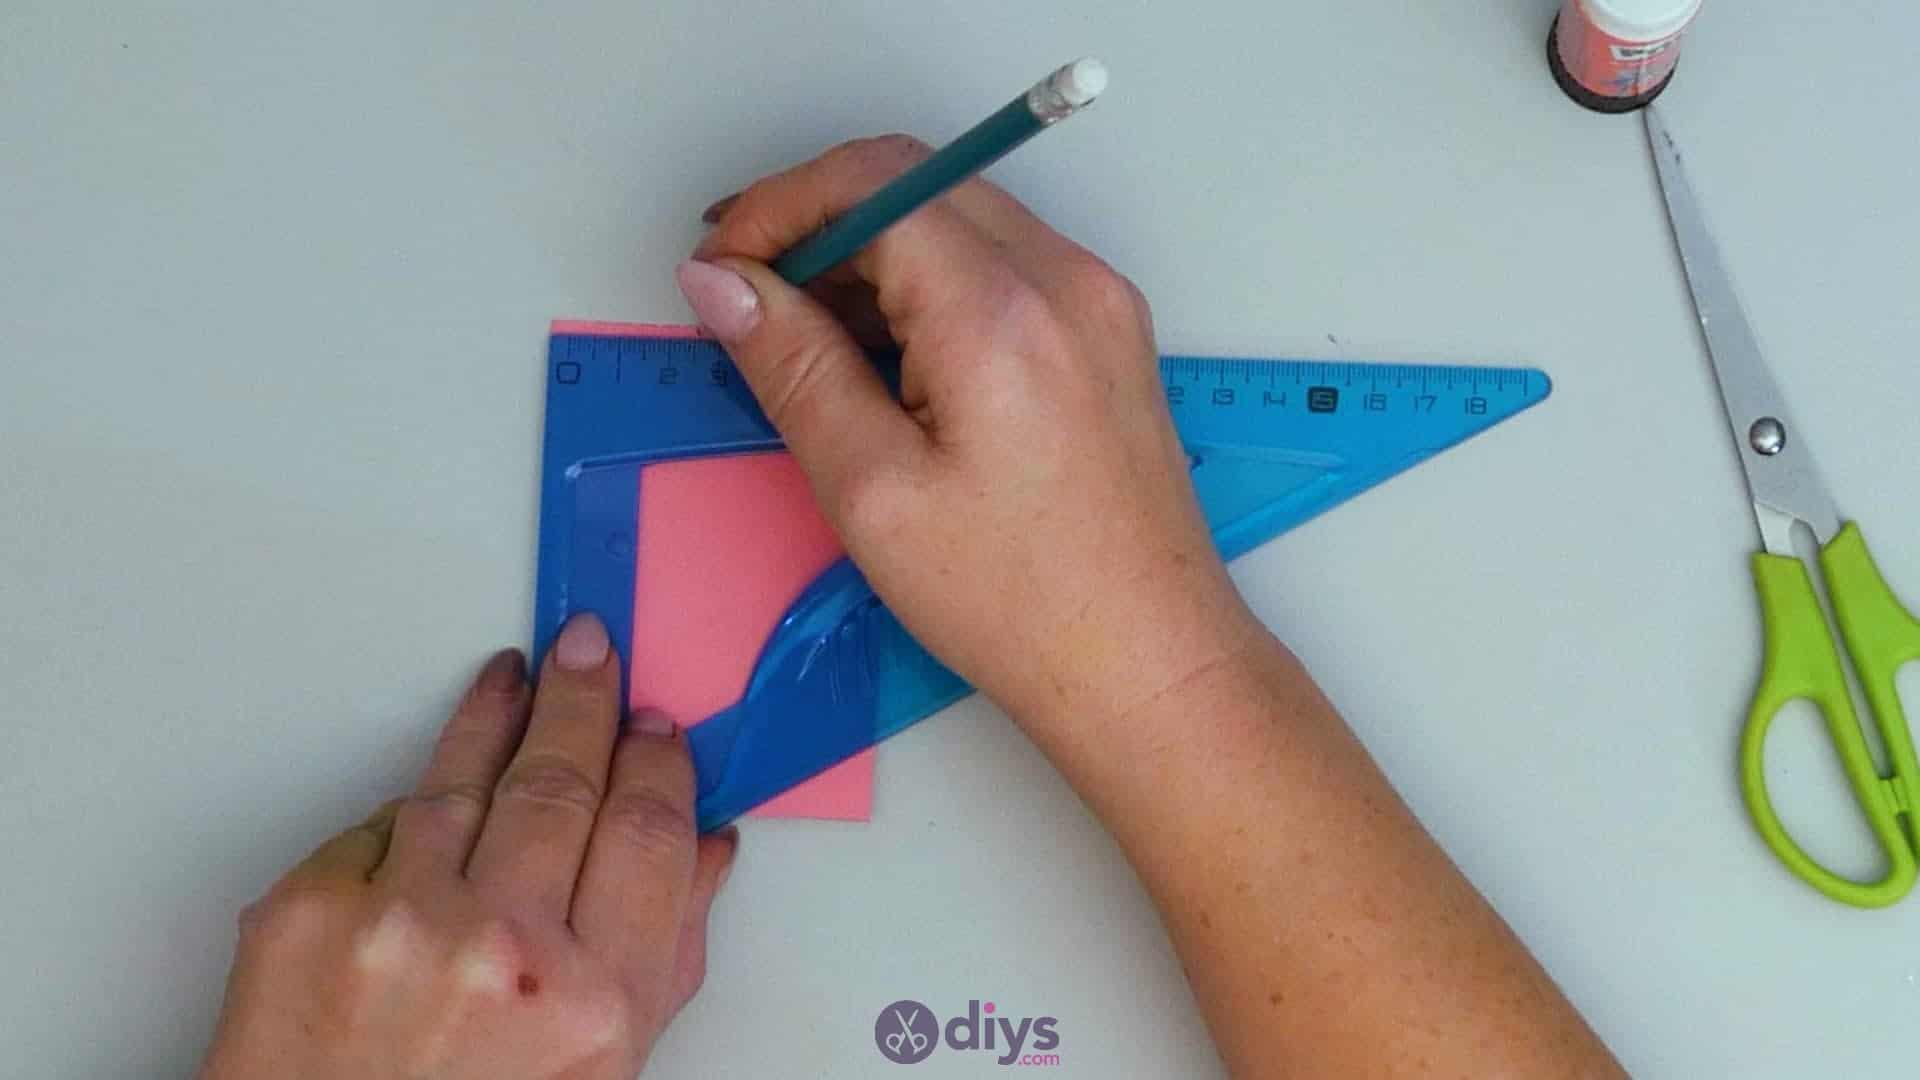 Diy lipstick gift card step 5